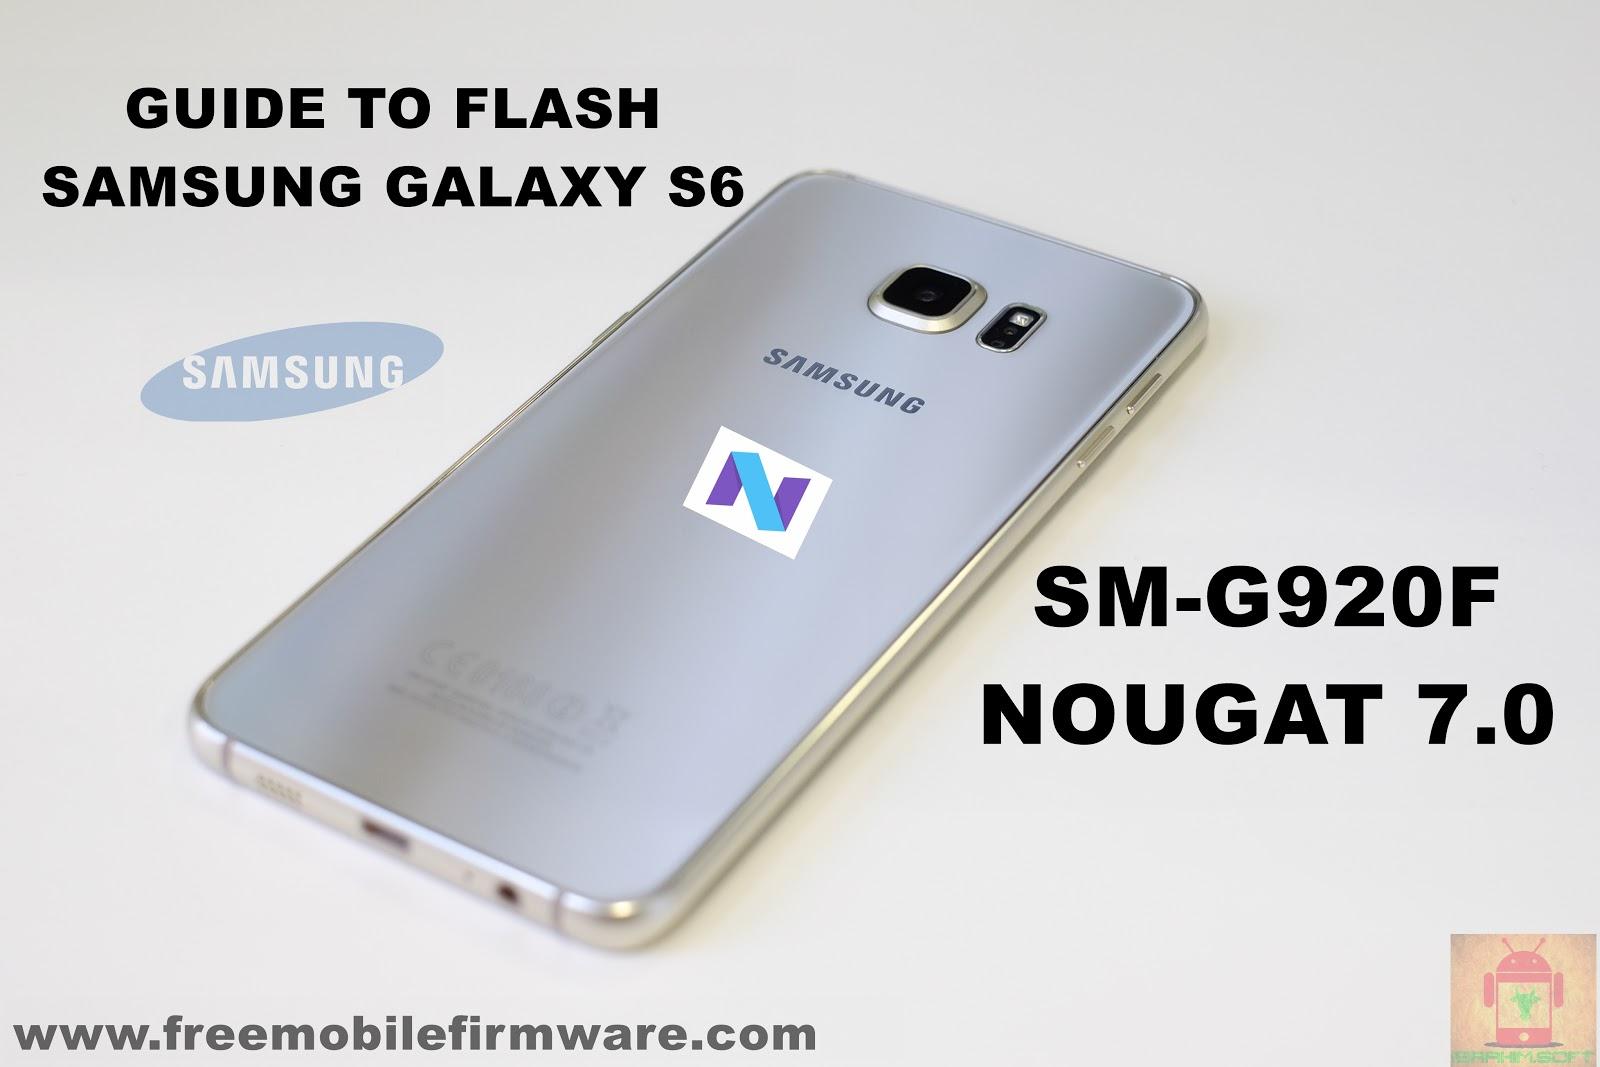 sm-g920f firmware